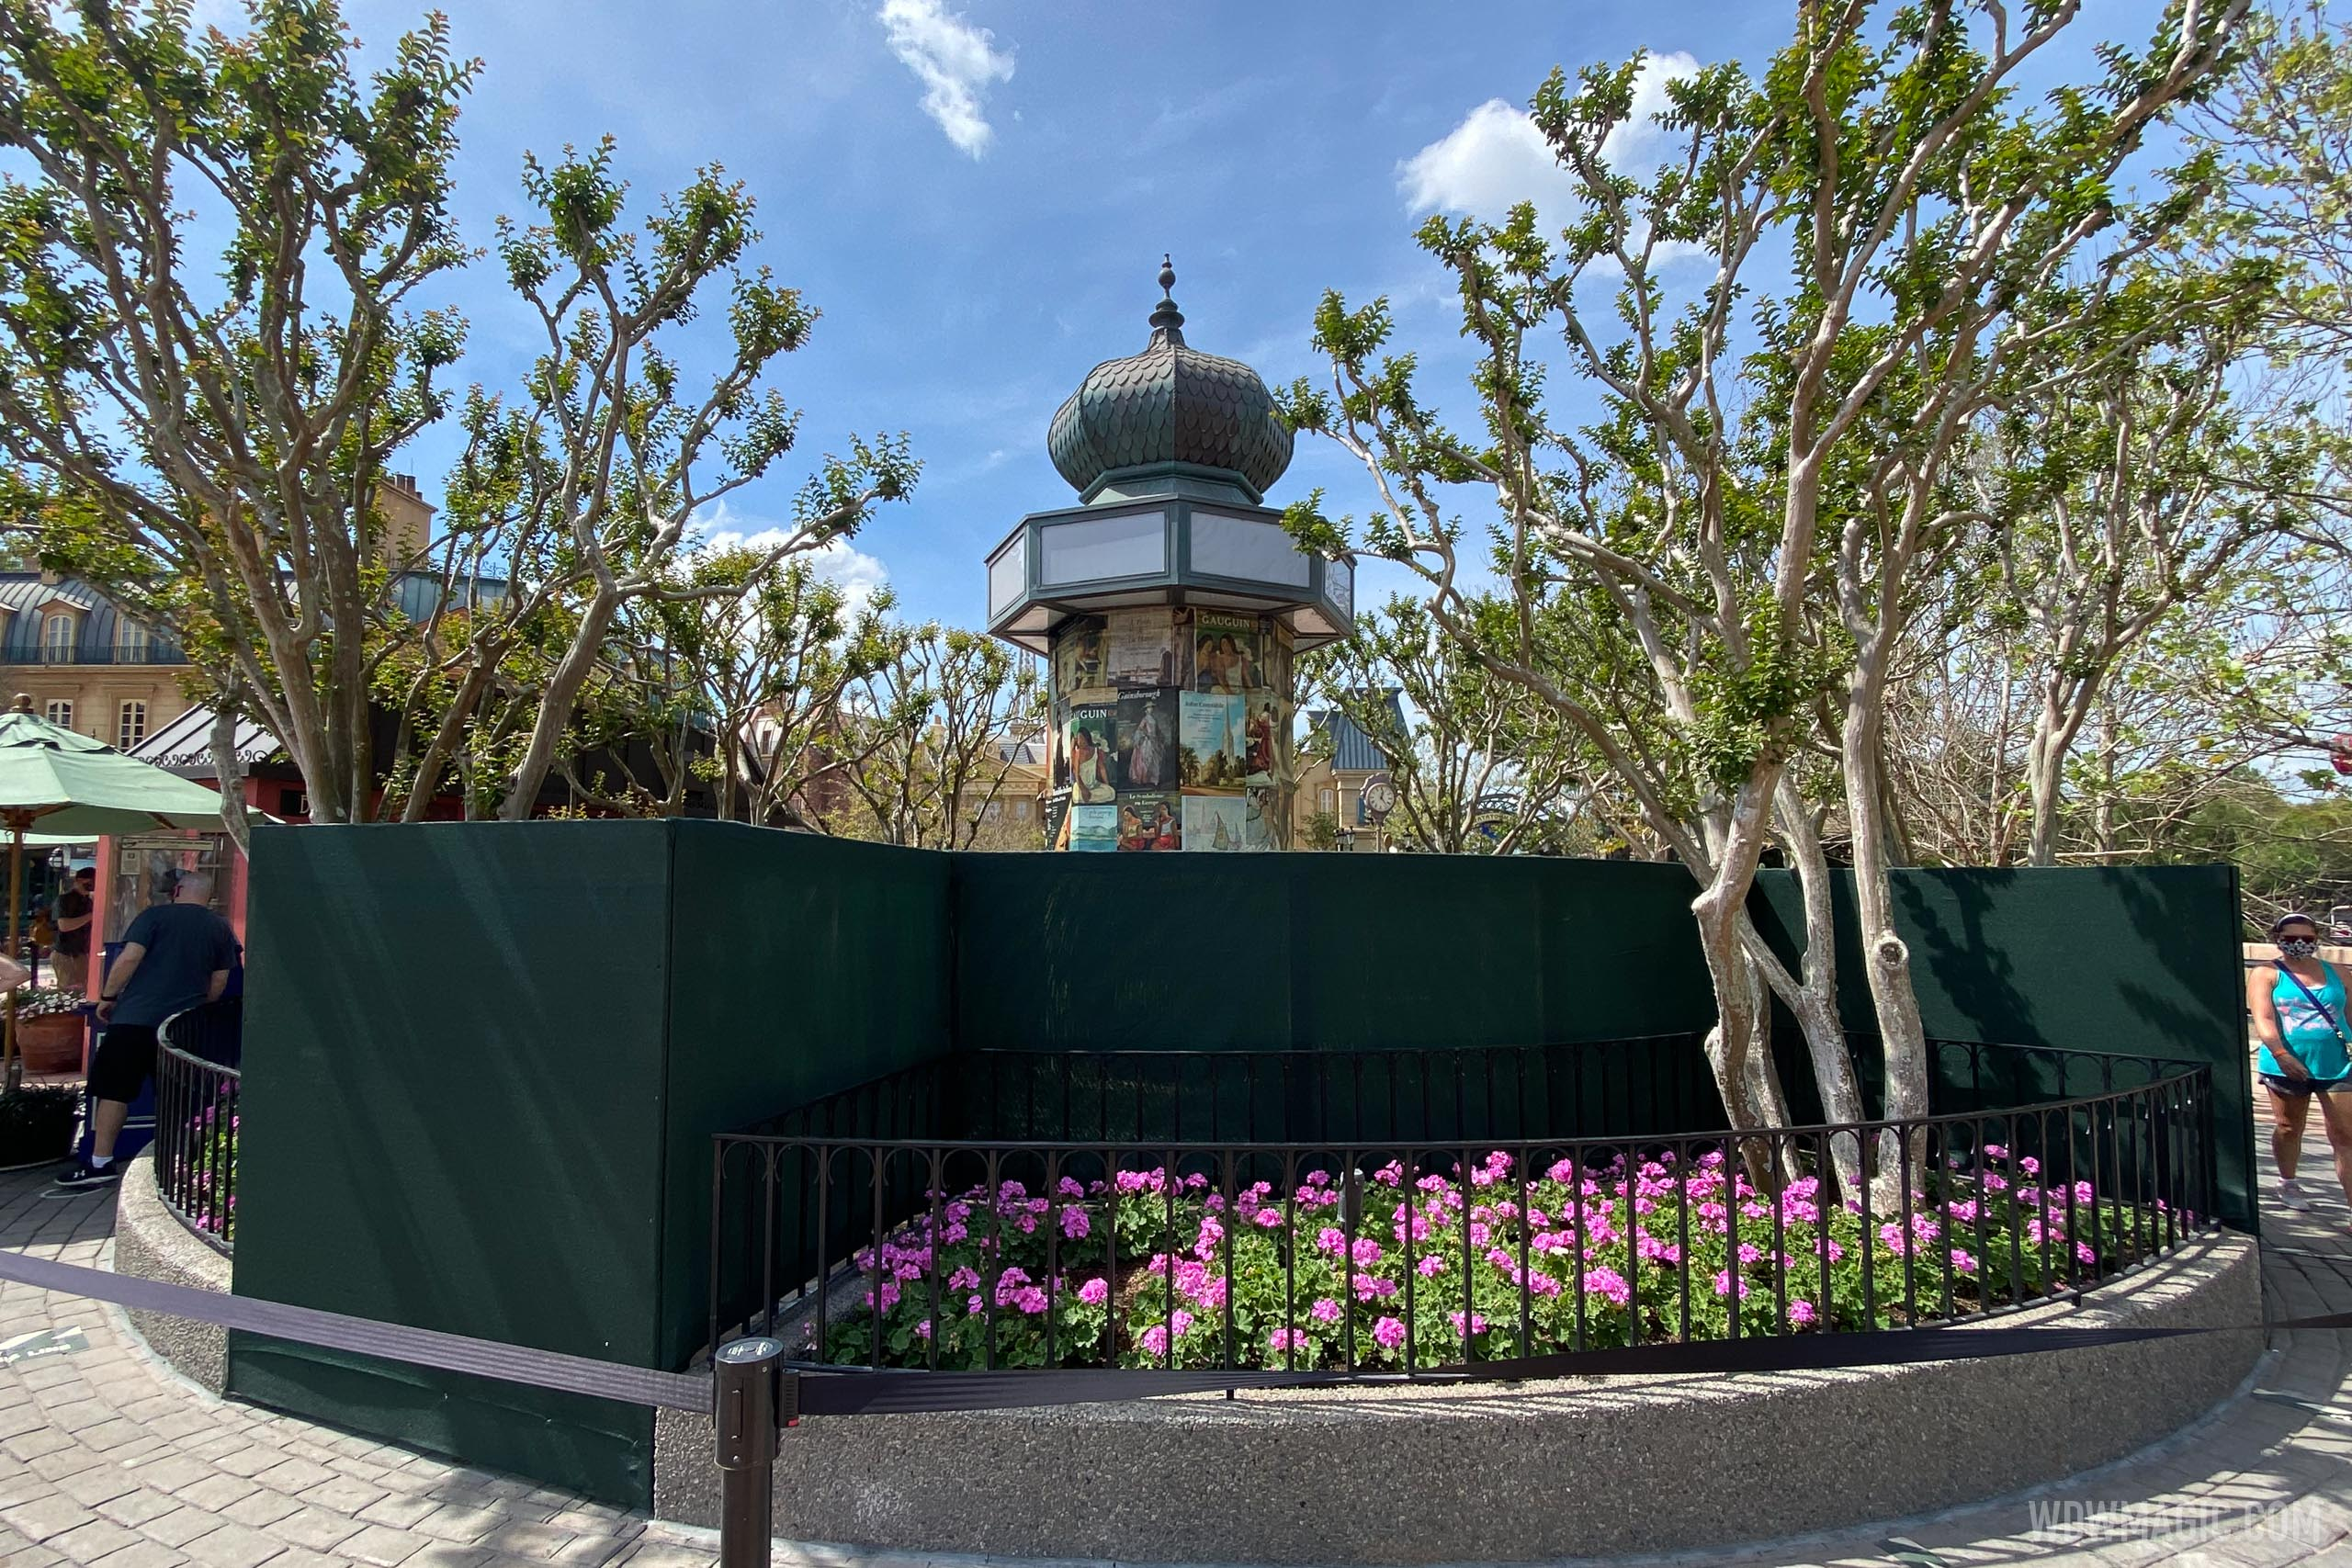 France Pavilion Morris Column refurbishment